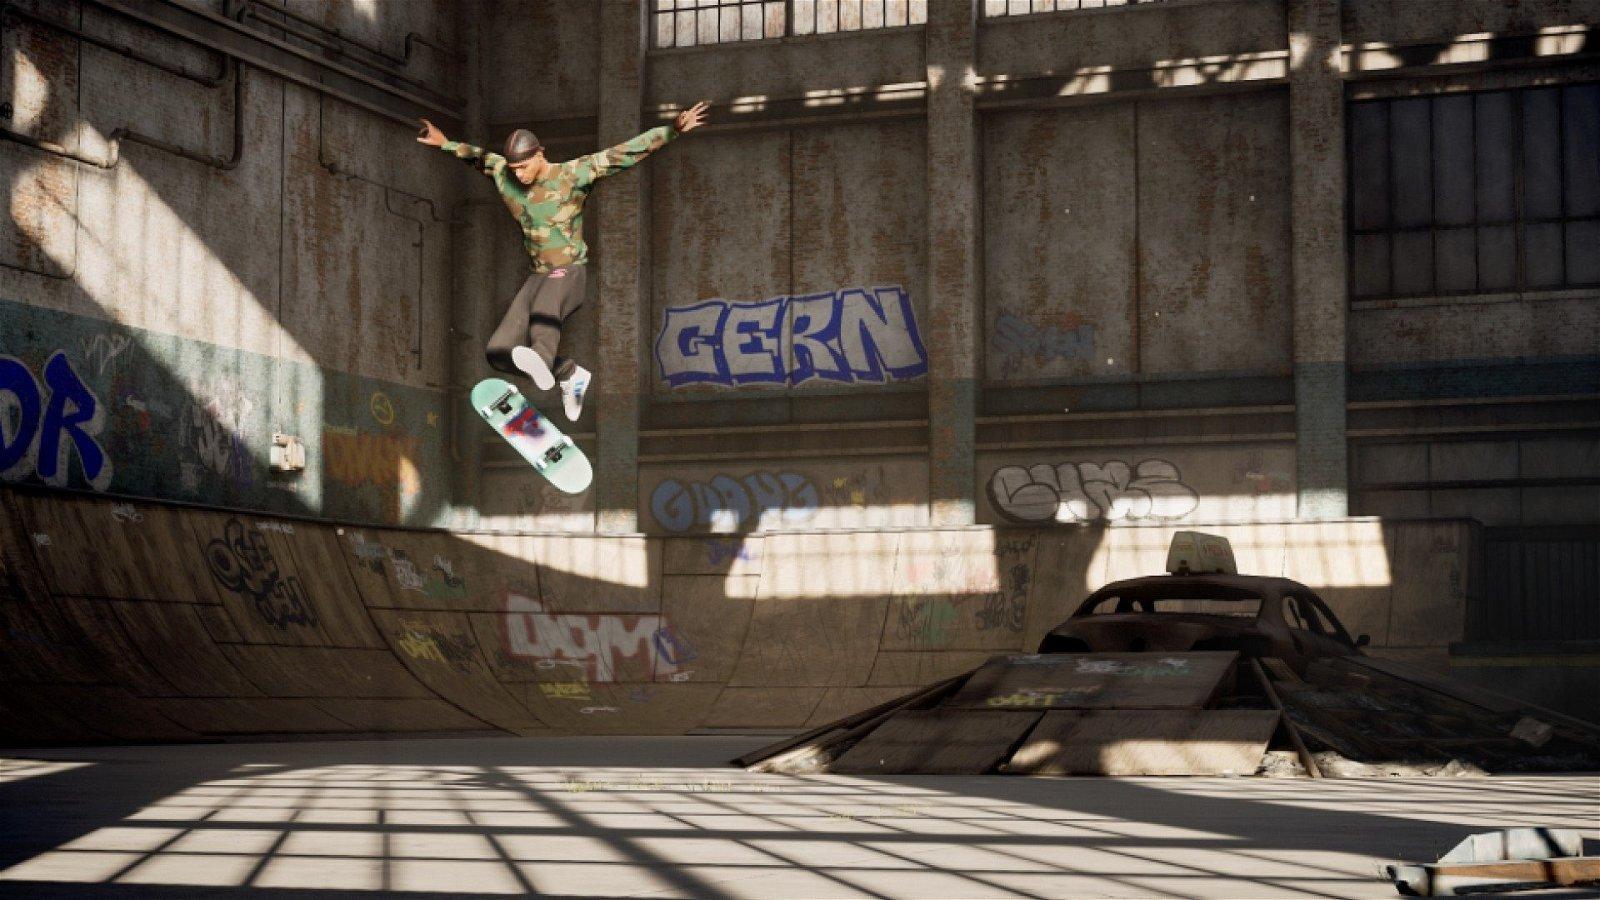 Tony Hawk's Pro Skater 1 + 2 (PS5) Review 3